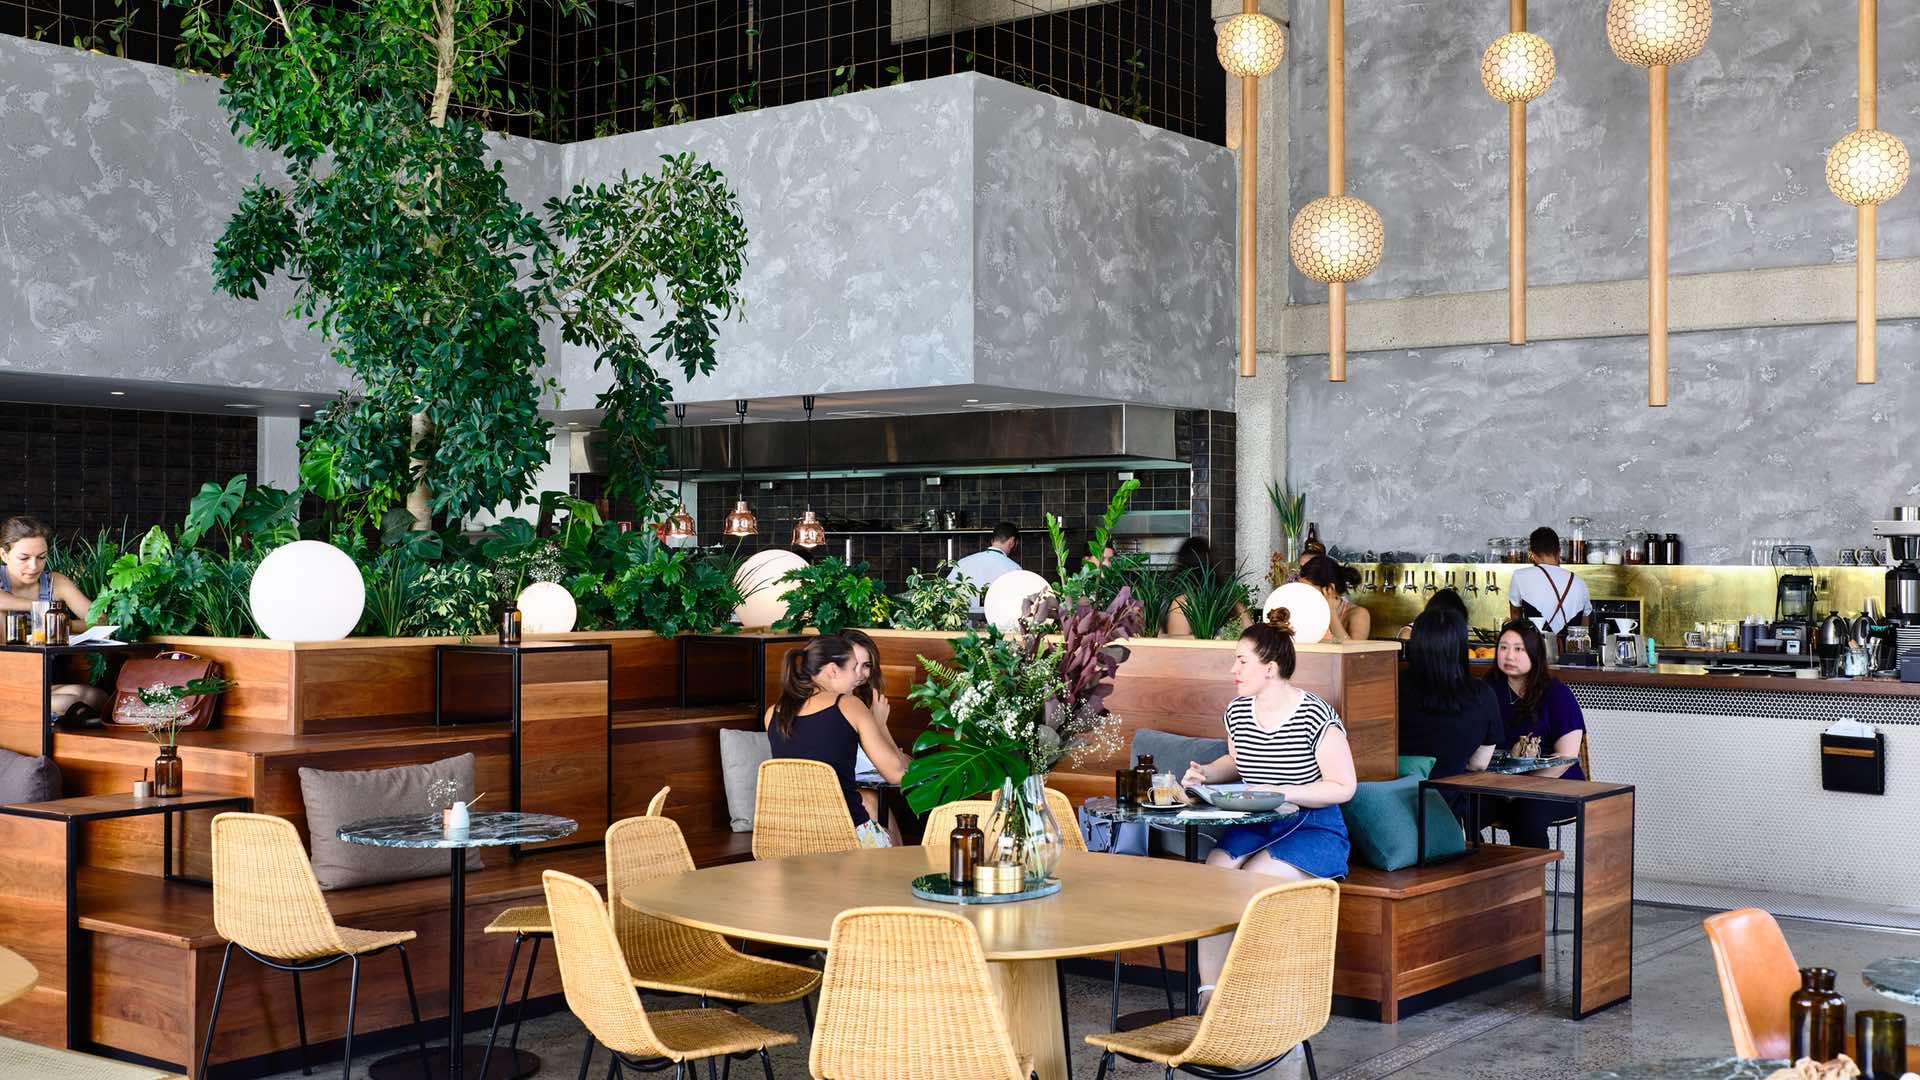 Cotta Cafe Melbourn : Melbournes best new cafes of 2017 concrete playground concrete